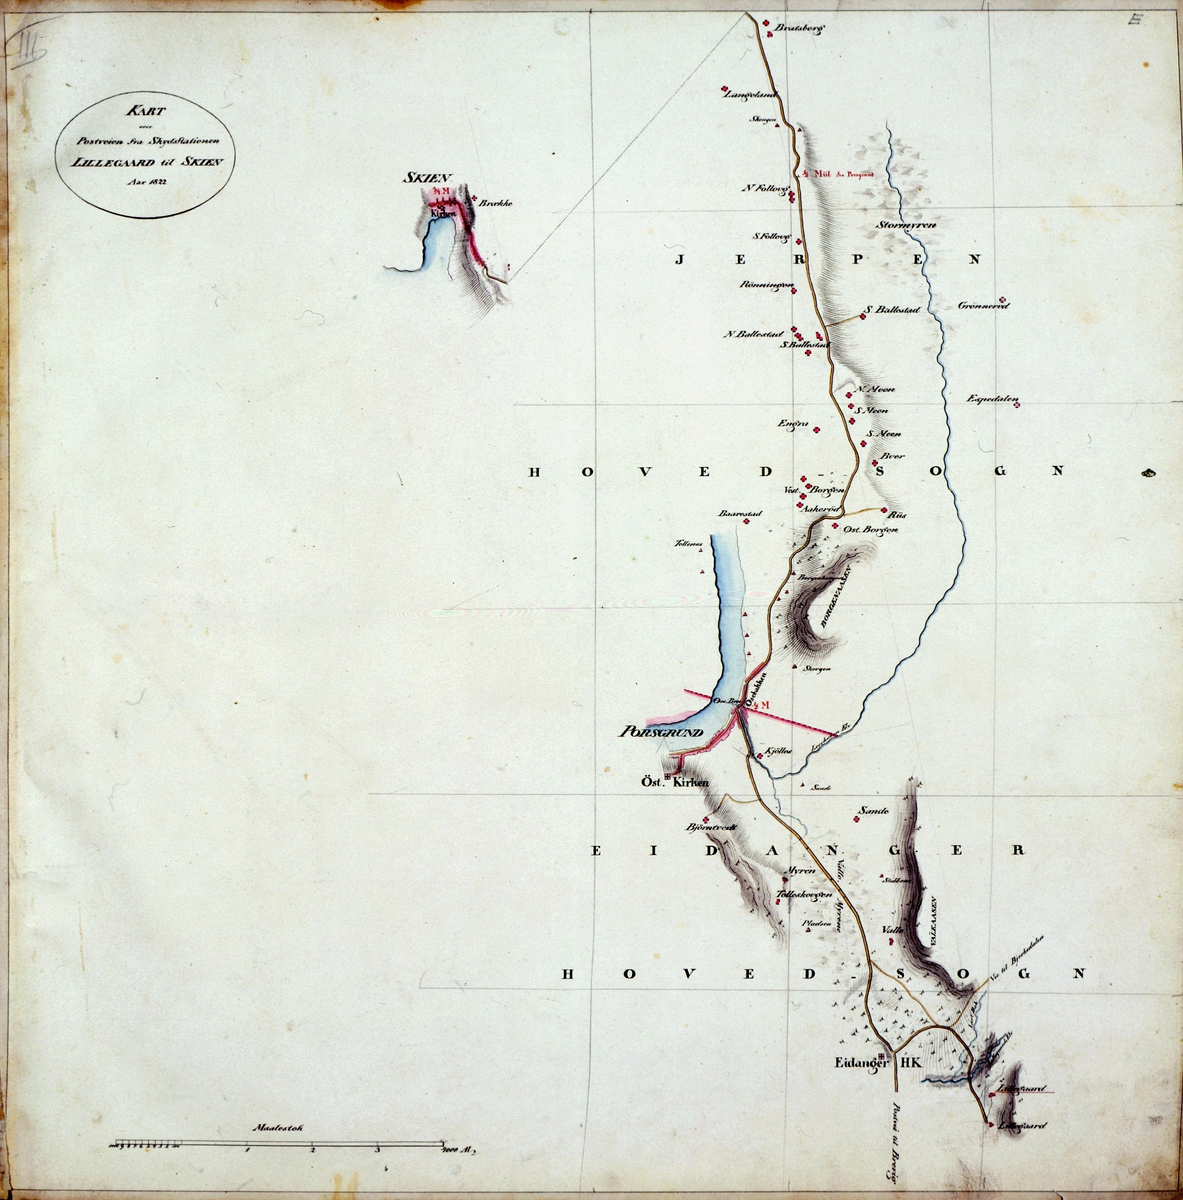 kart, postkart, kart over postveien fra Skydstationen Lillegaard til Skien Aar 1822